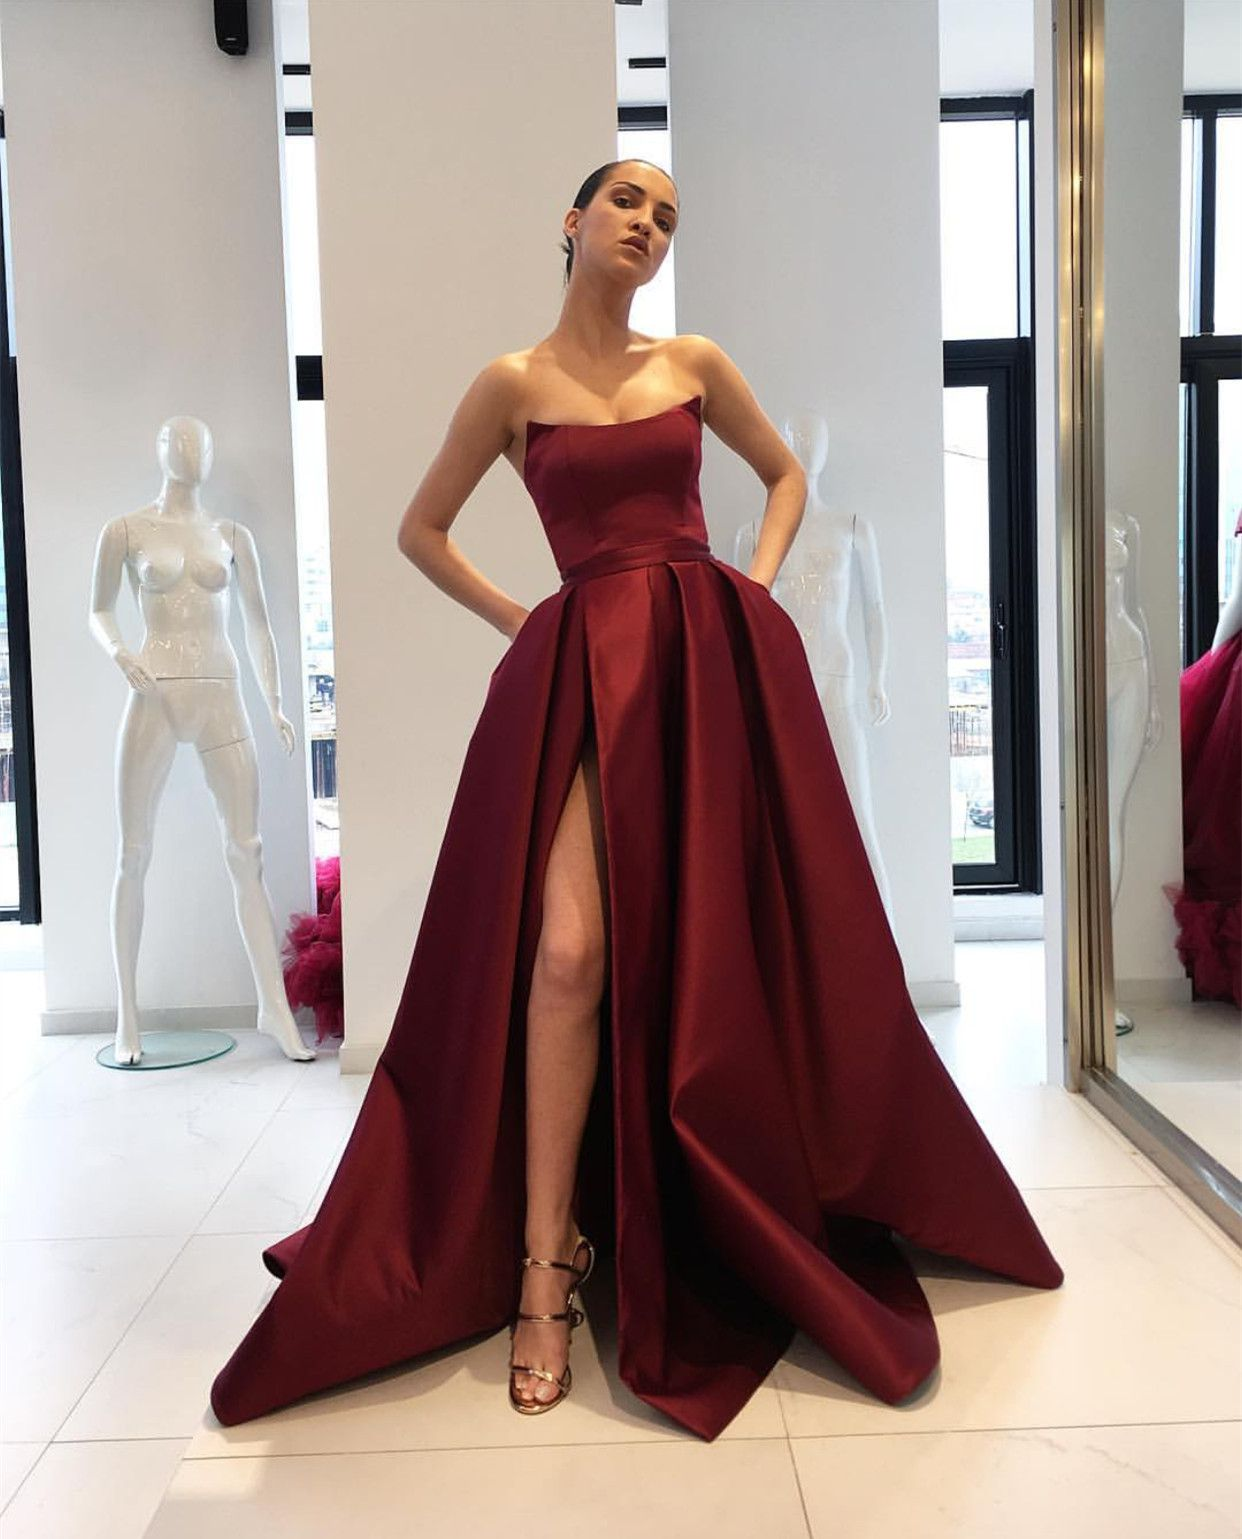 Burgundy Strapless Prom Dress with Slit $155 #promdress #promgown #burgundy  #fashion #dress